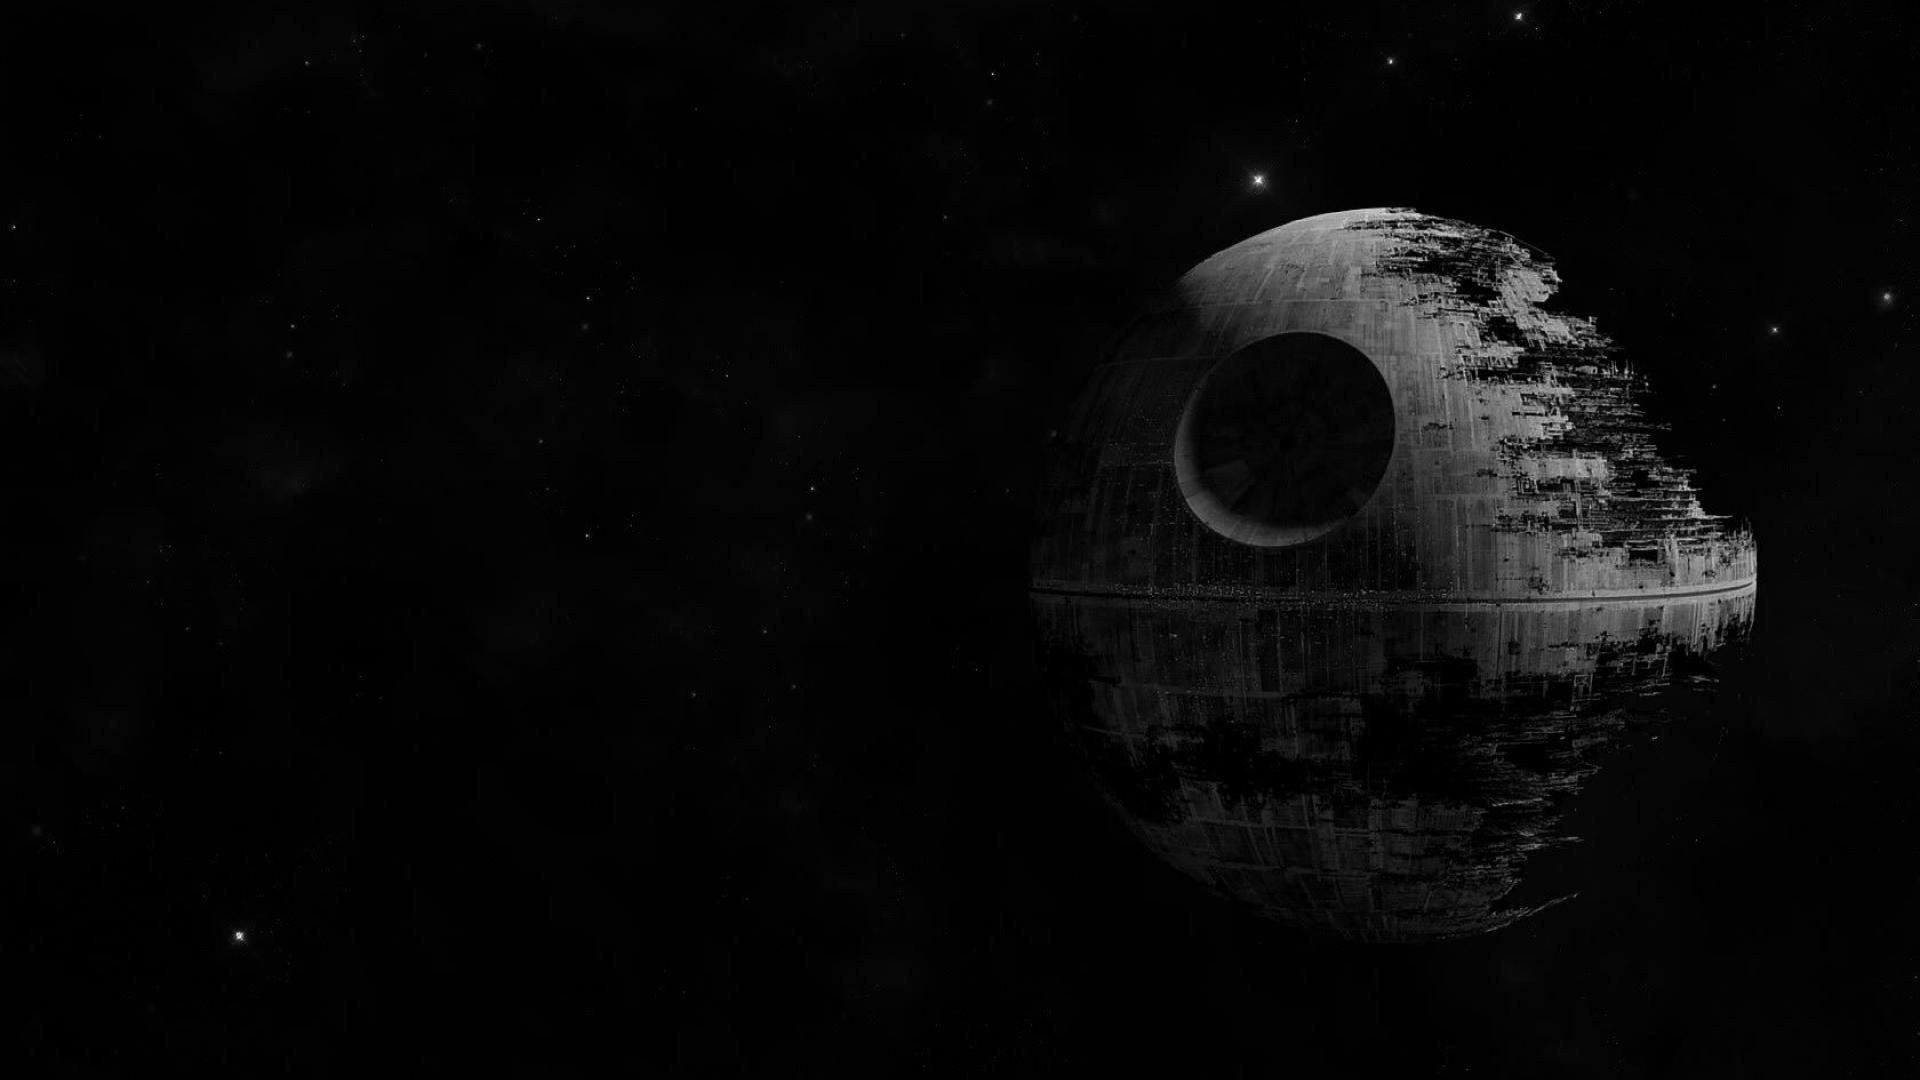 Star Wars Wallpaper   3840×1200   ID:51798   Epic Car Wallpapers    Pinterest   Star wars wallpaper and Wallpaper